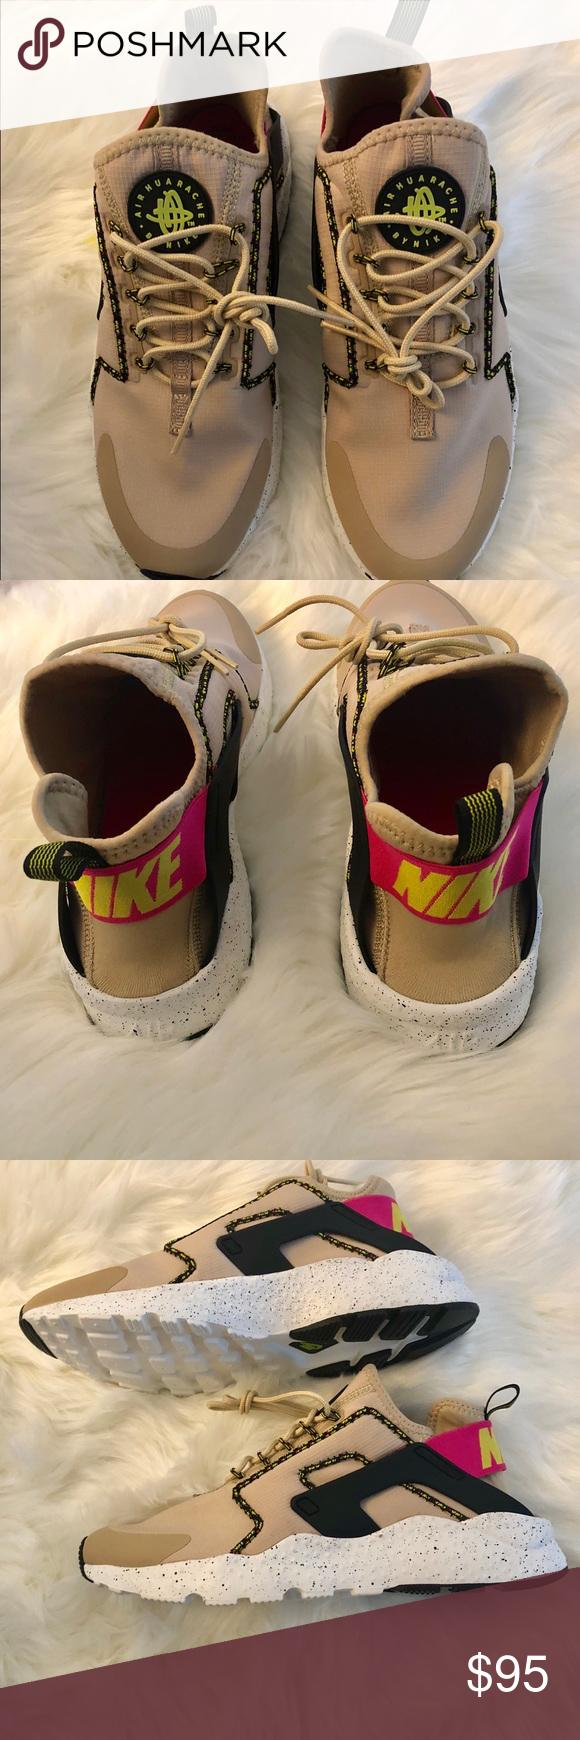 Nike Air Huarache Run Ultra Size WMN 11